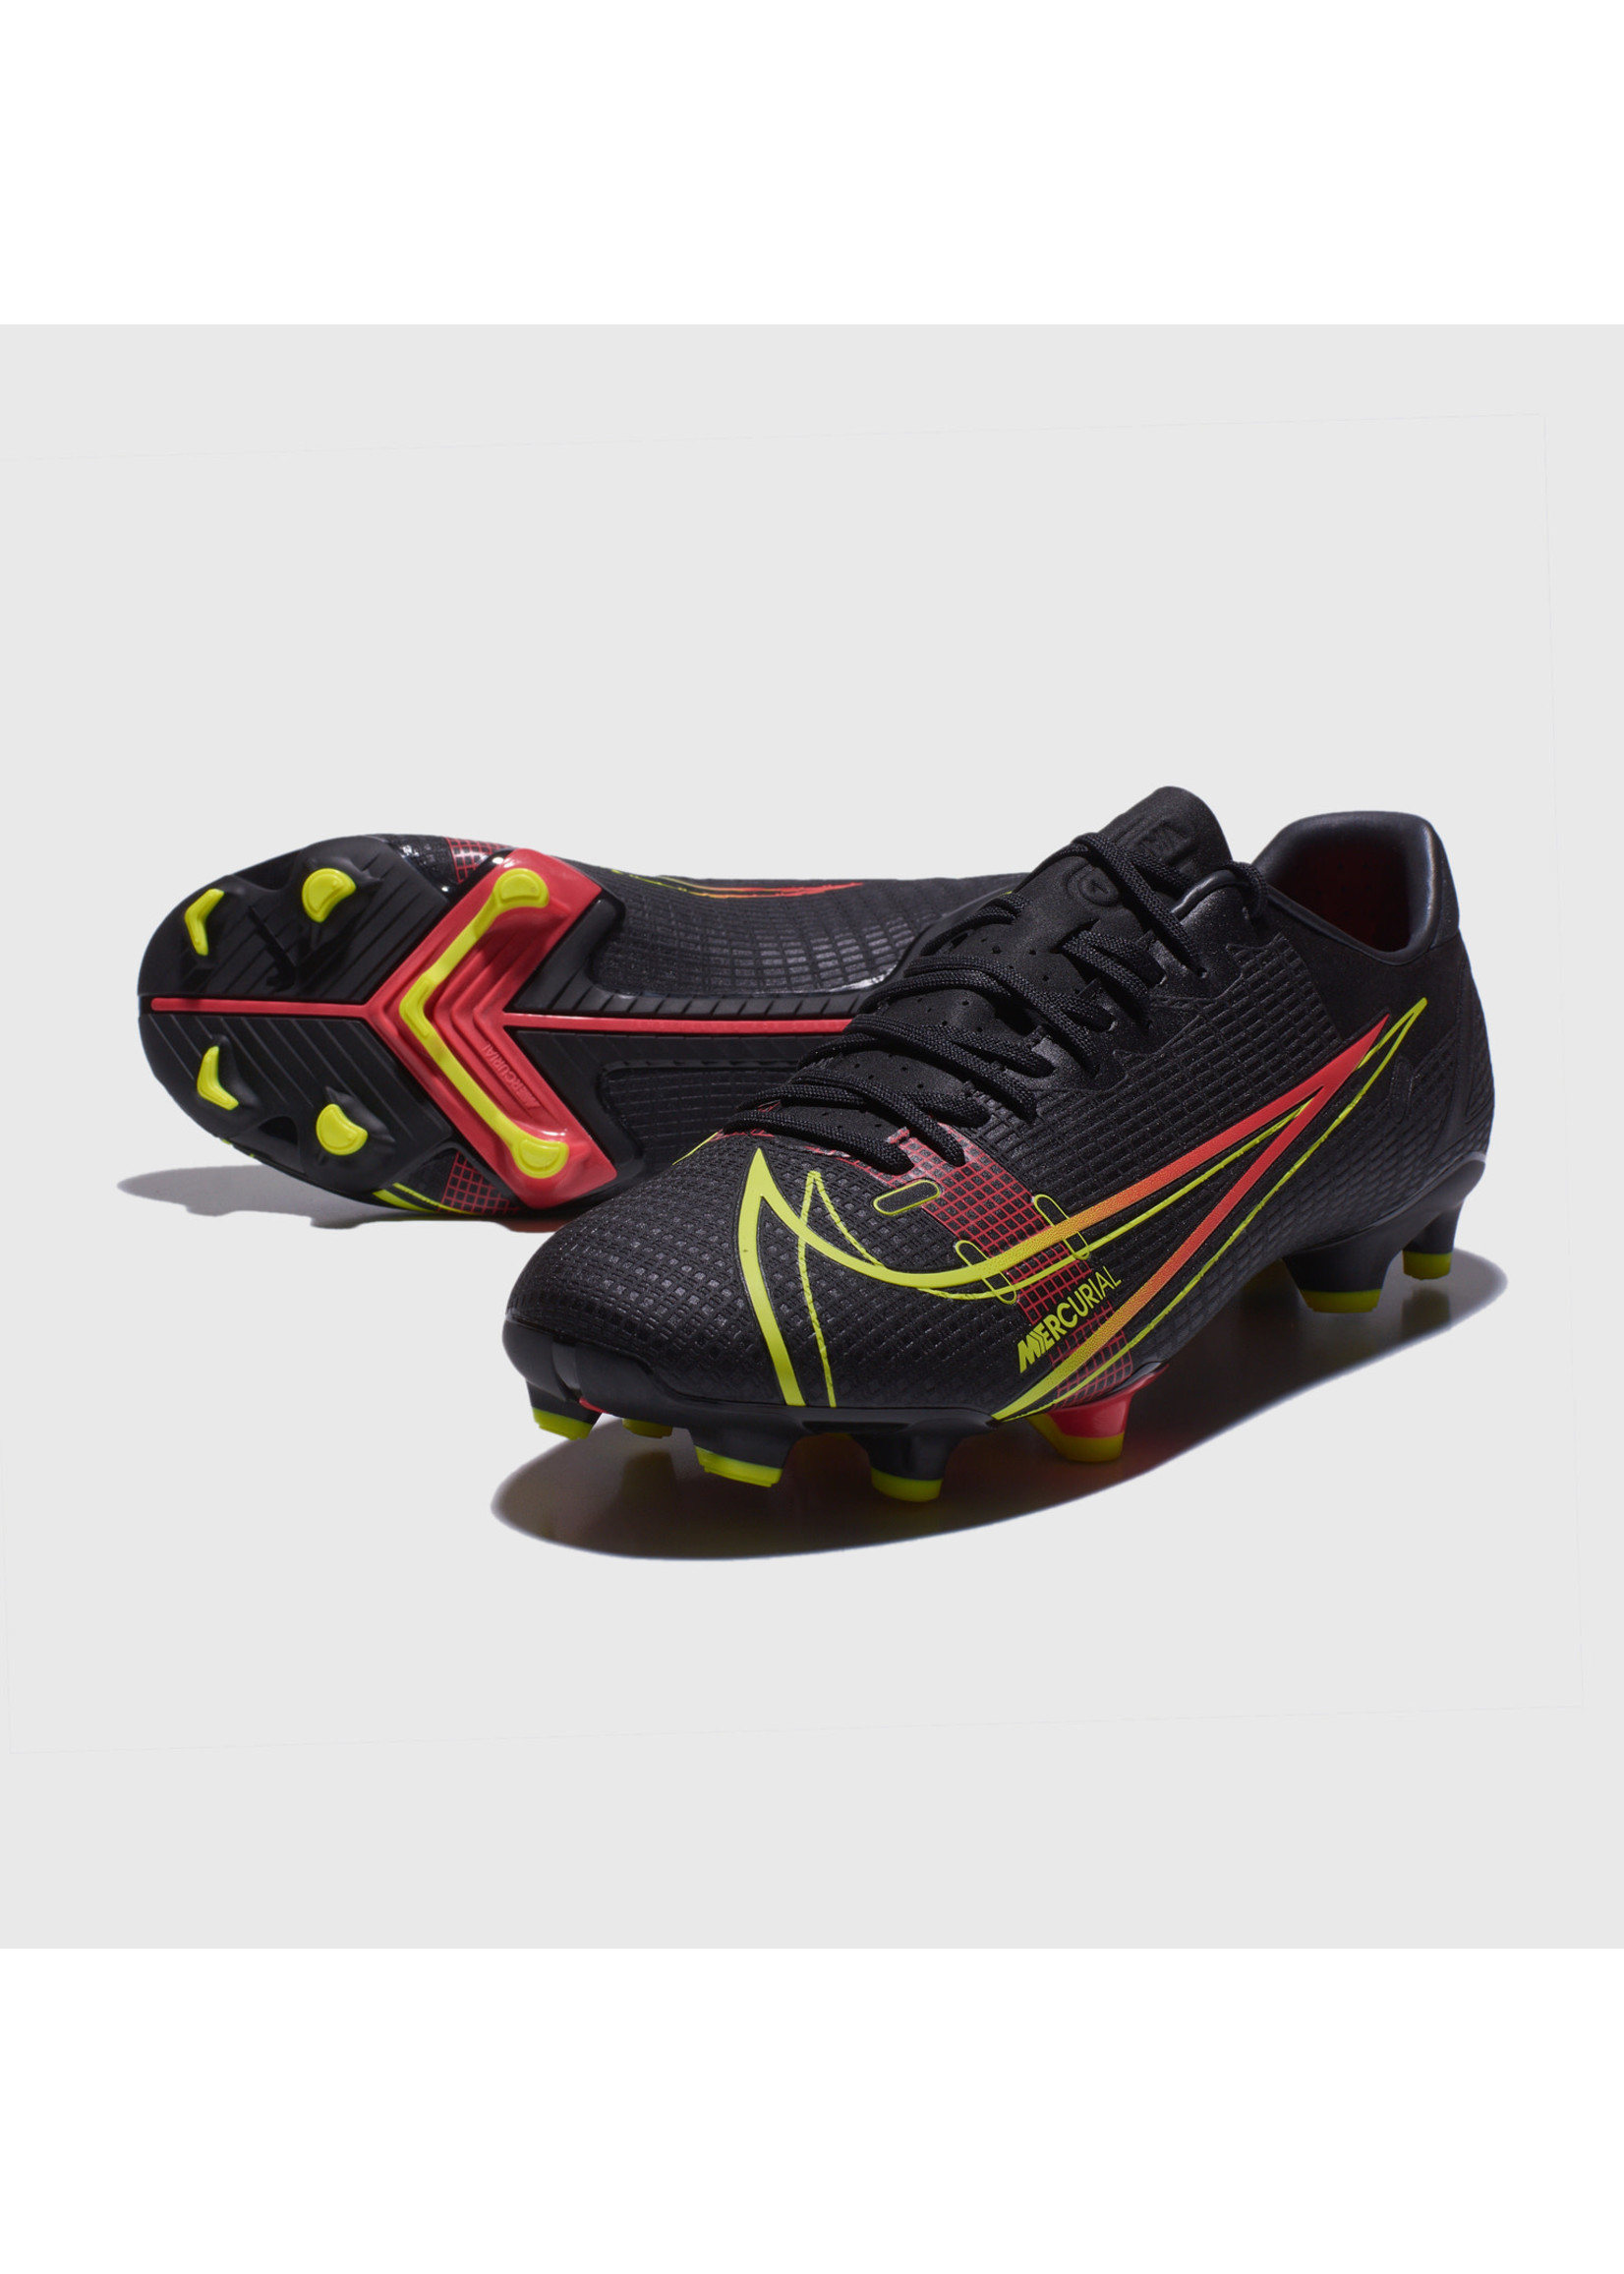 Nike VAPOR 14 ACADEMY FG/MG